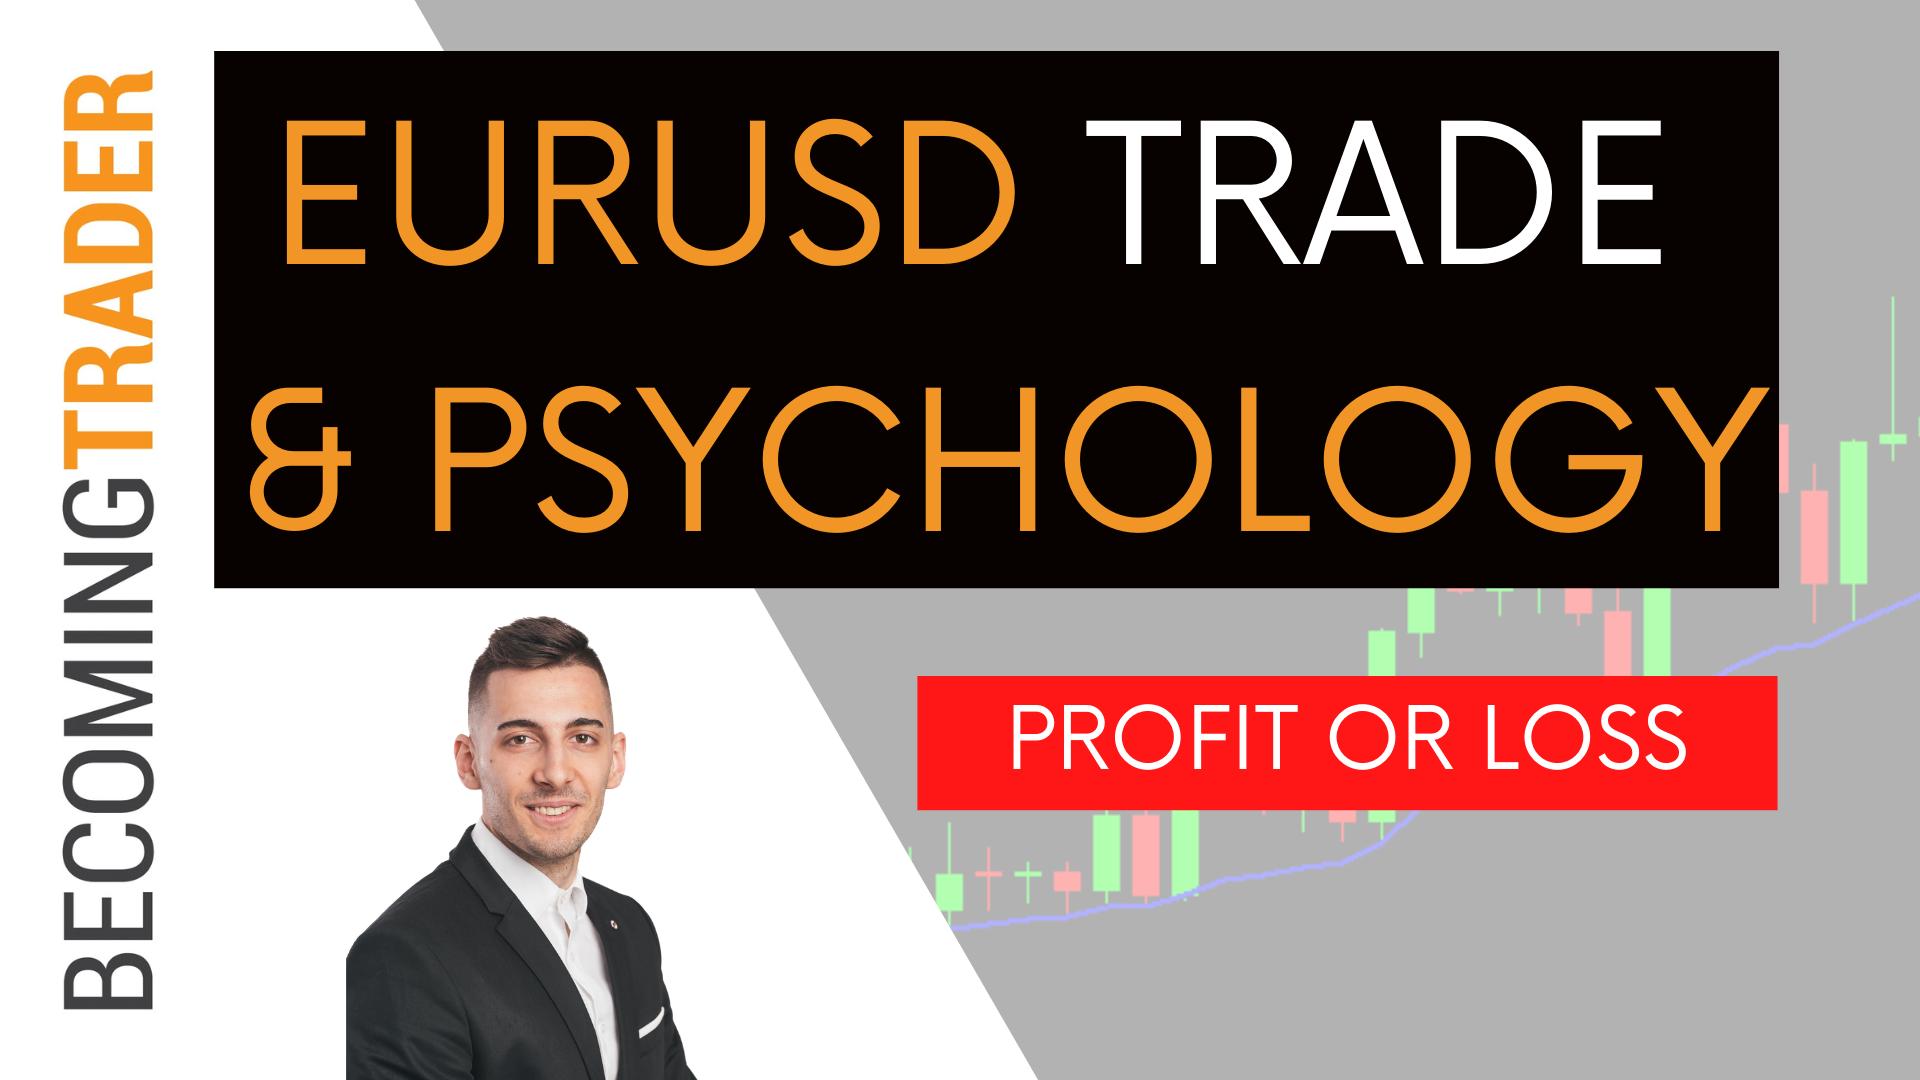 Let us talk about Trading Psychology | EUR/USD Forex Swing Trade & Mindset